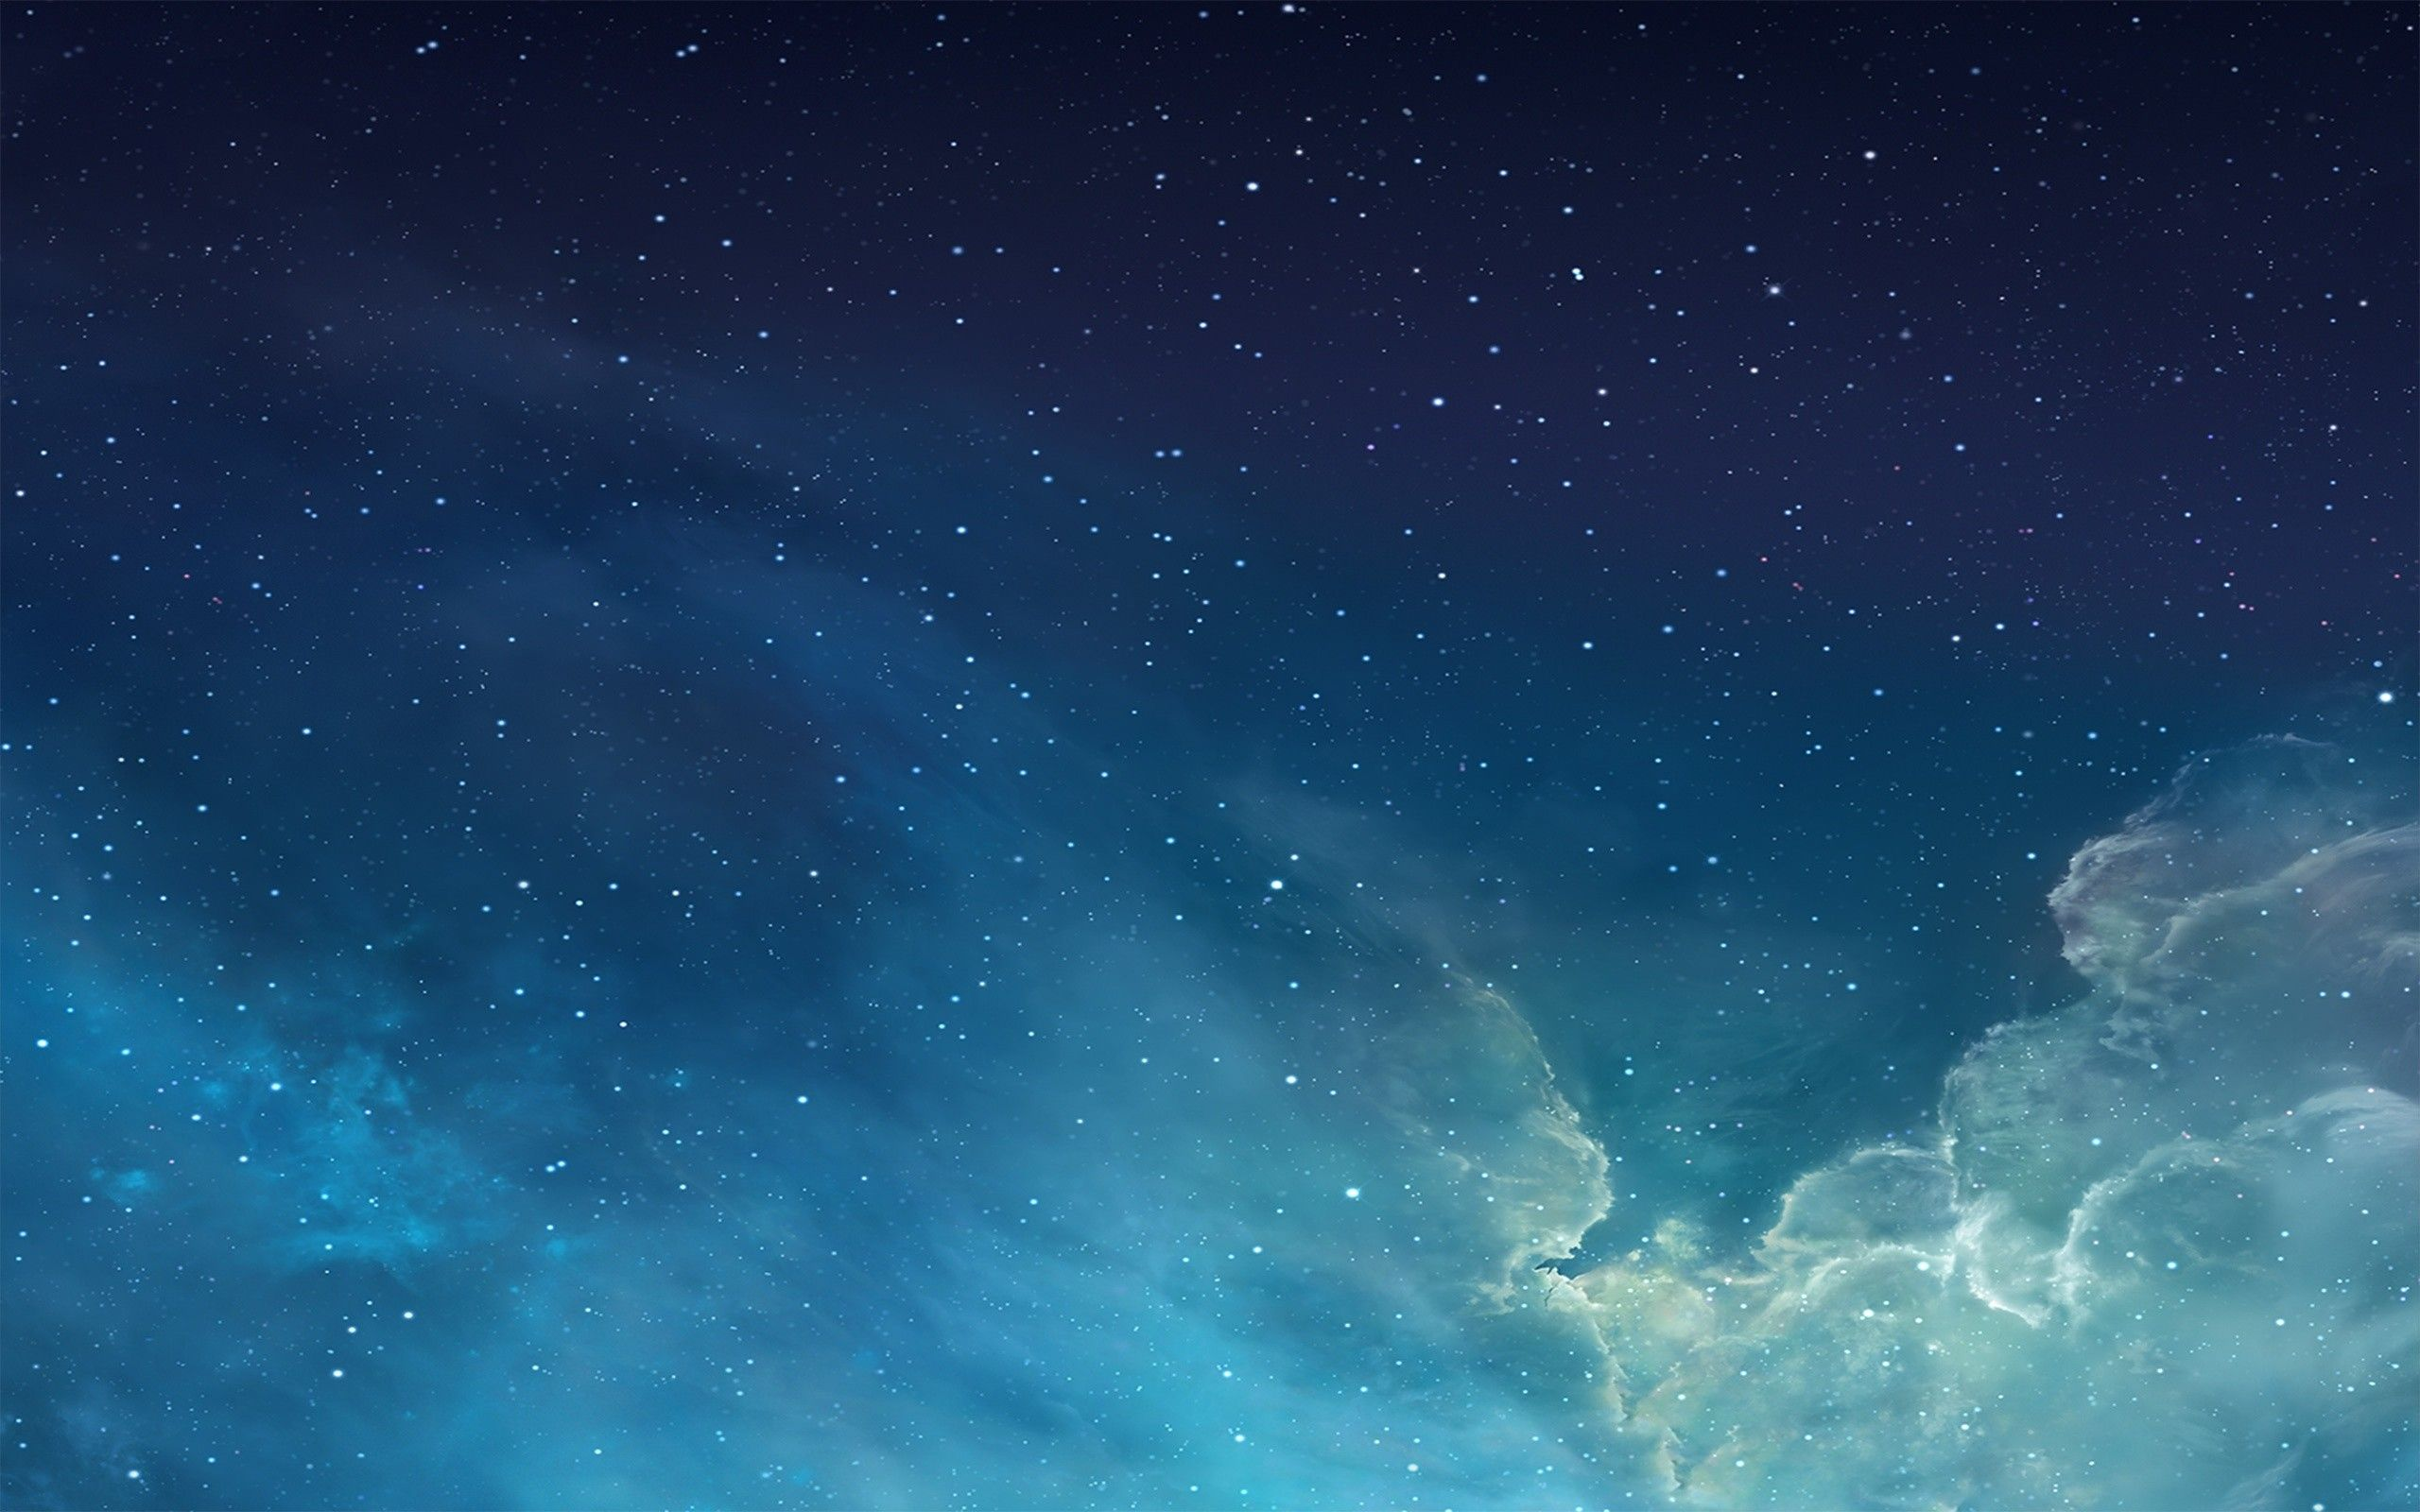 Aesthetic Blue Wallpapers On Wallpaperdog